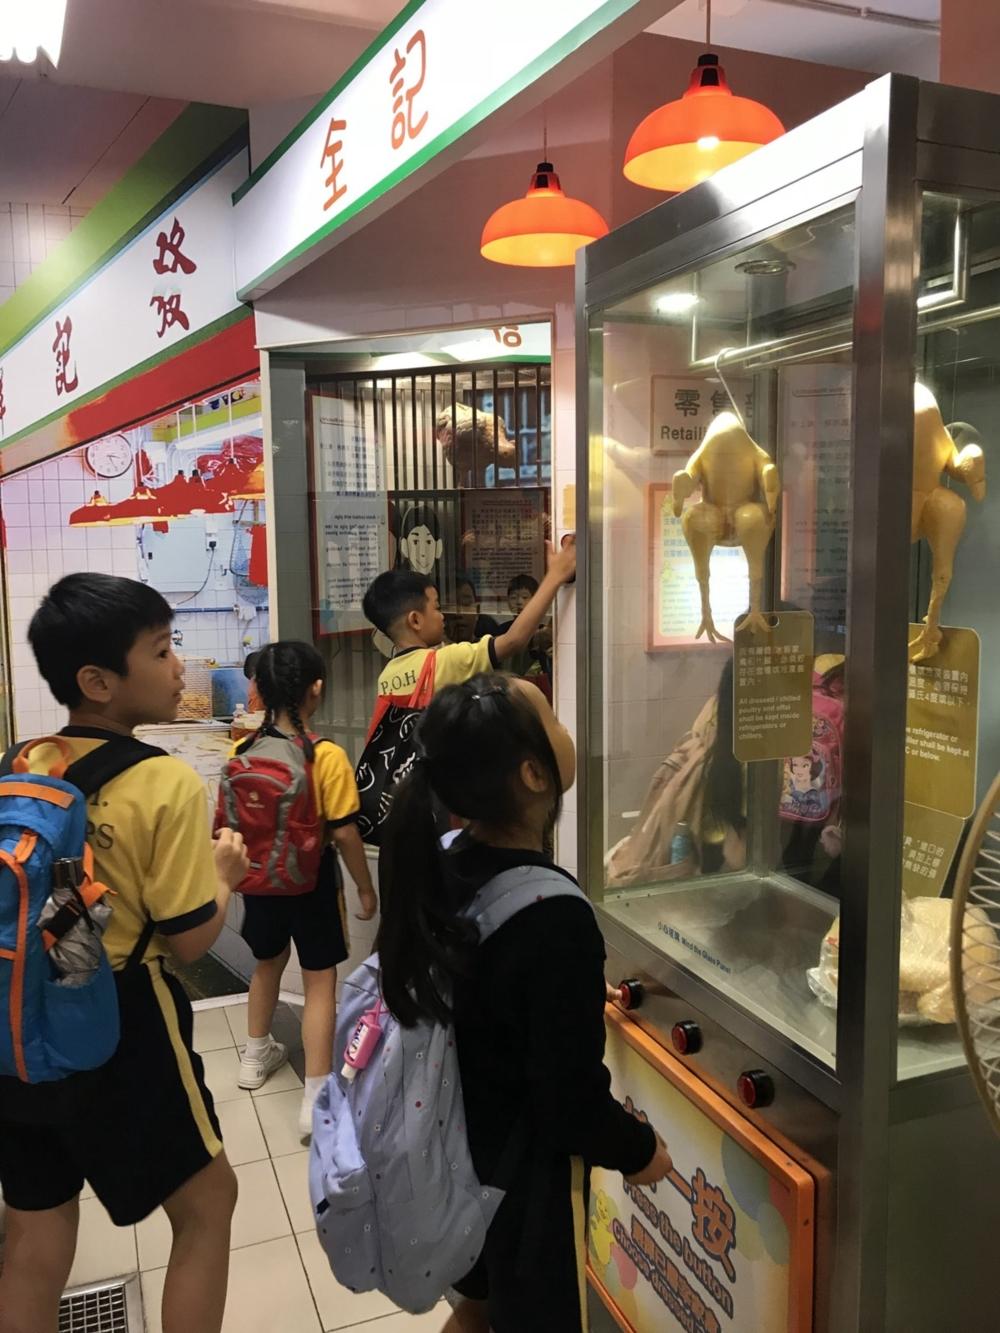 http://pohckwps.edu.hk/sites/default/files/60_5.jpg